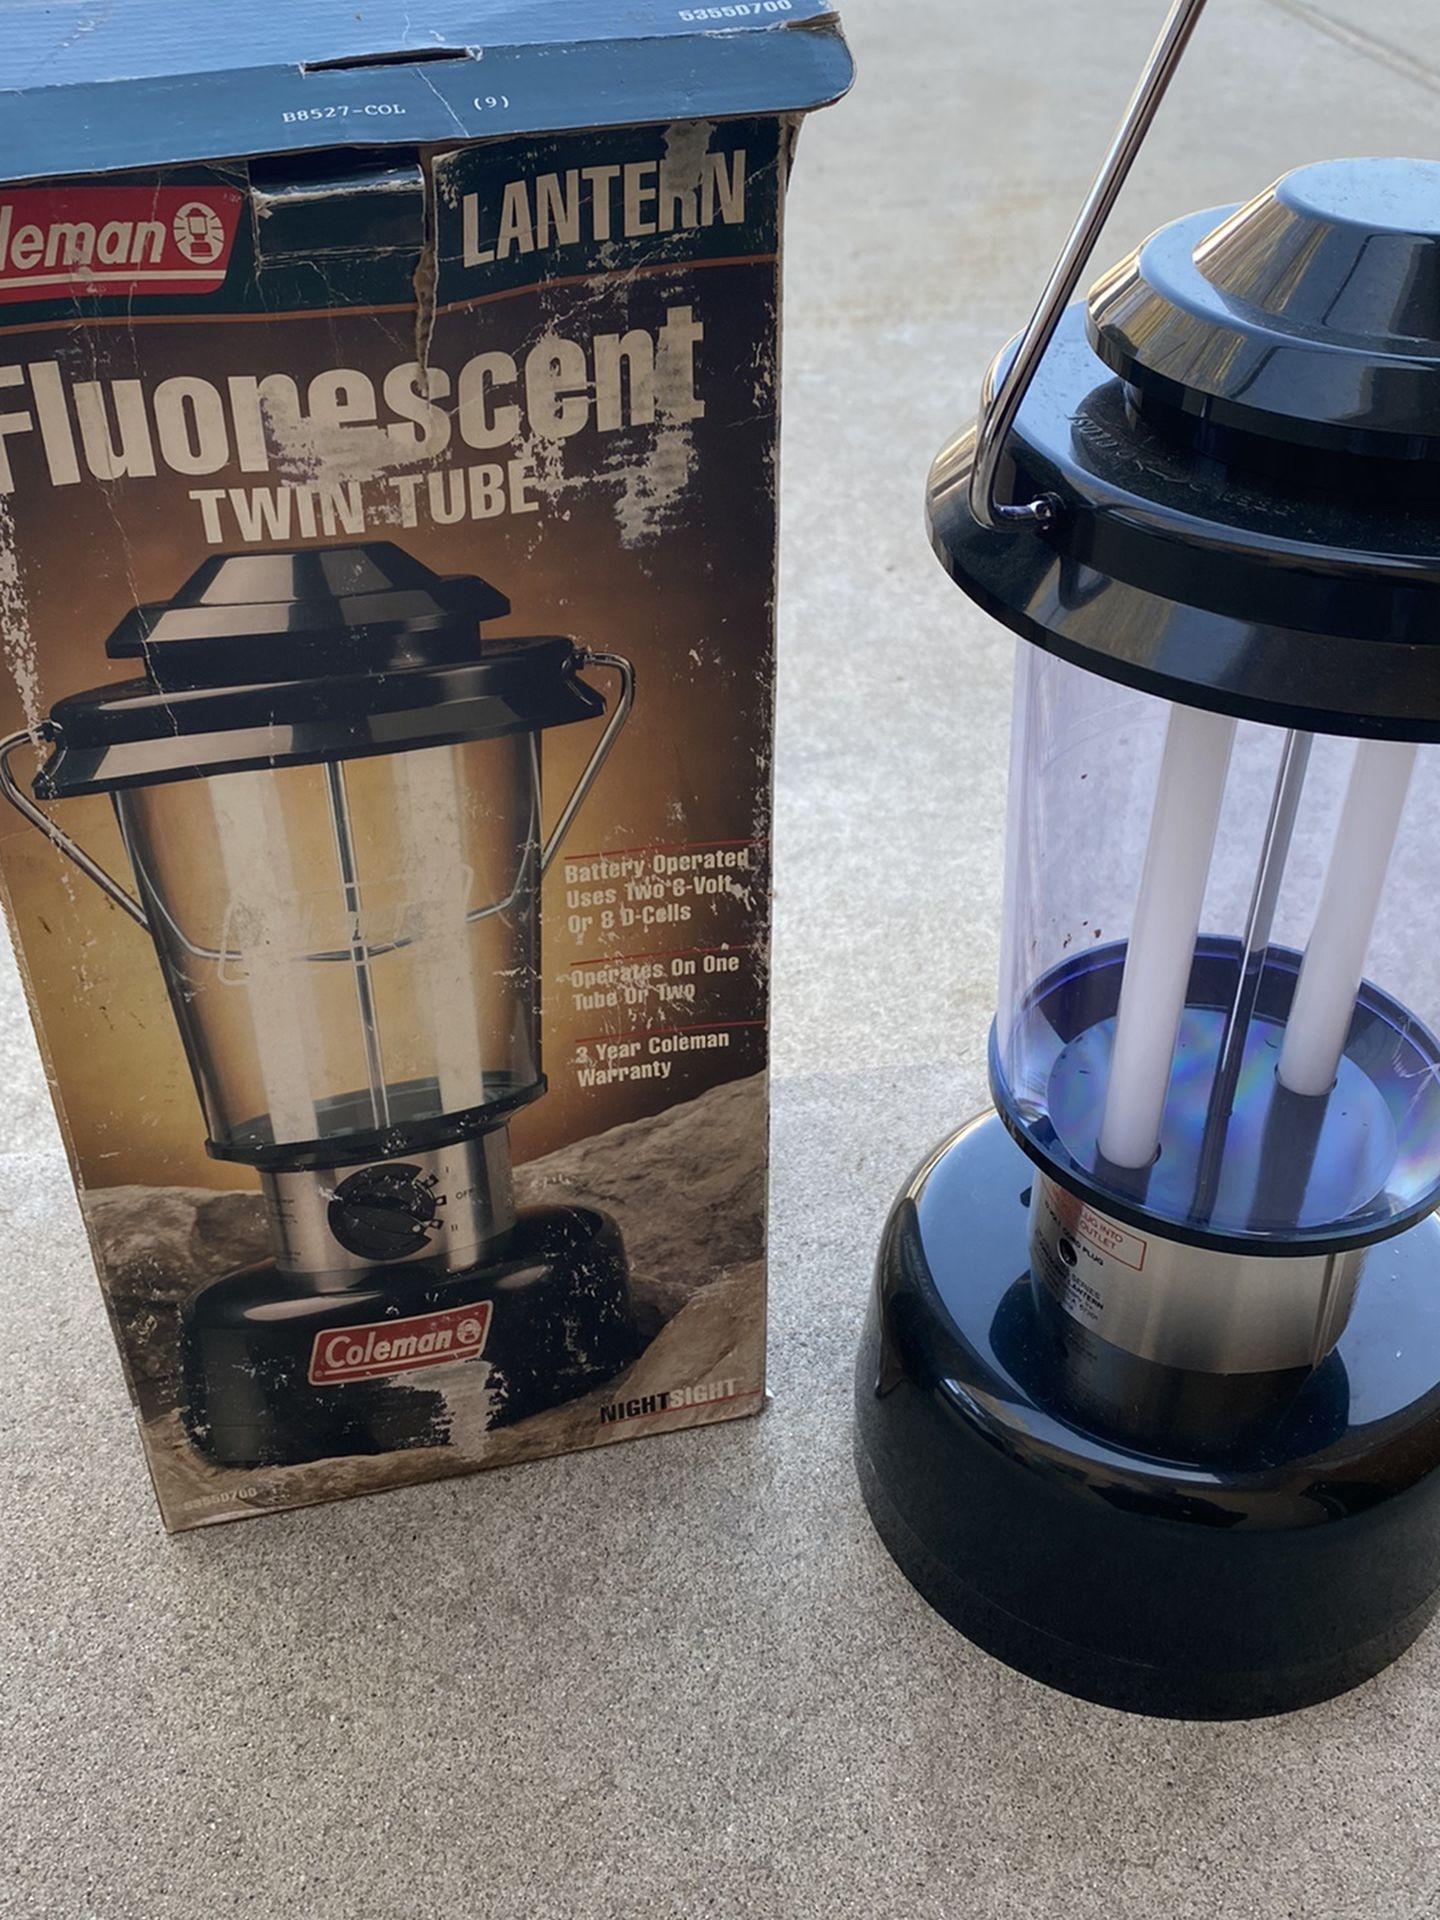 Fluorescent Twin Tube Lanter